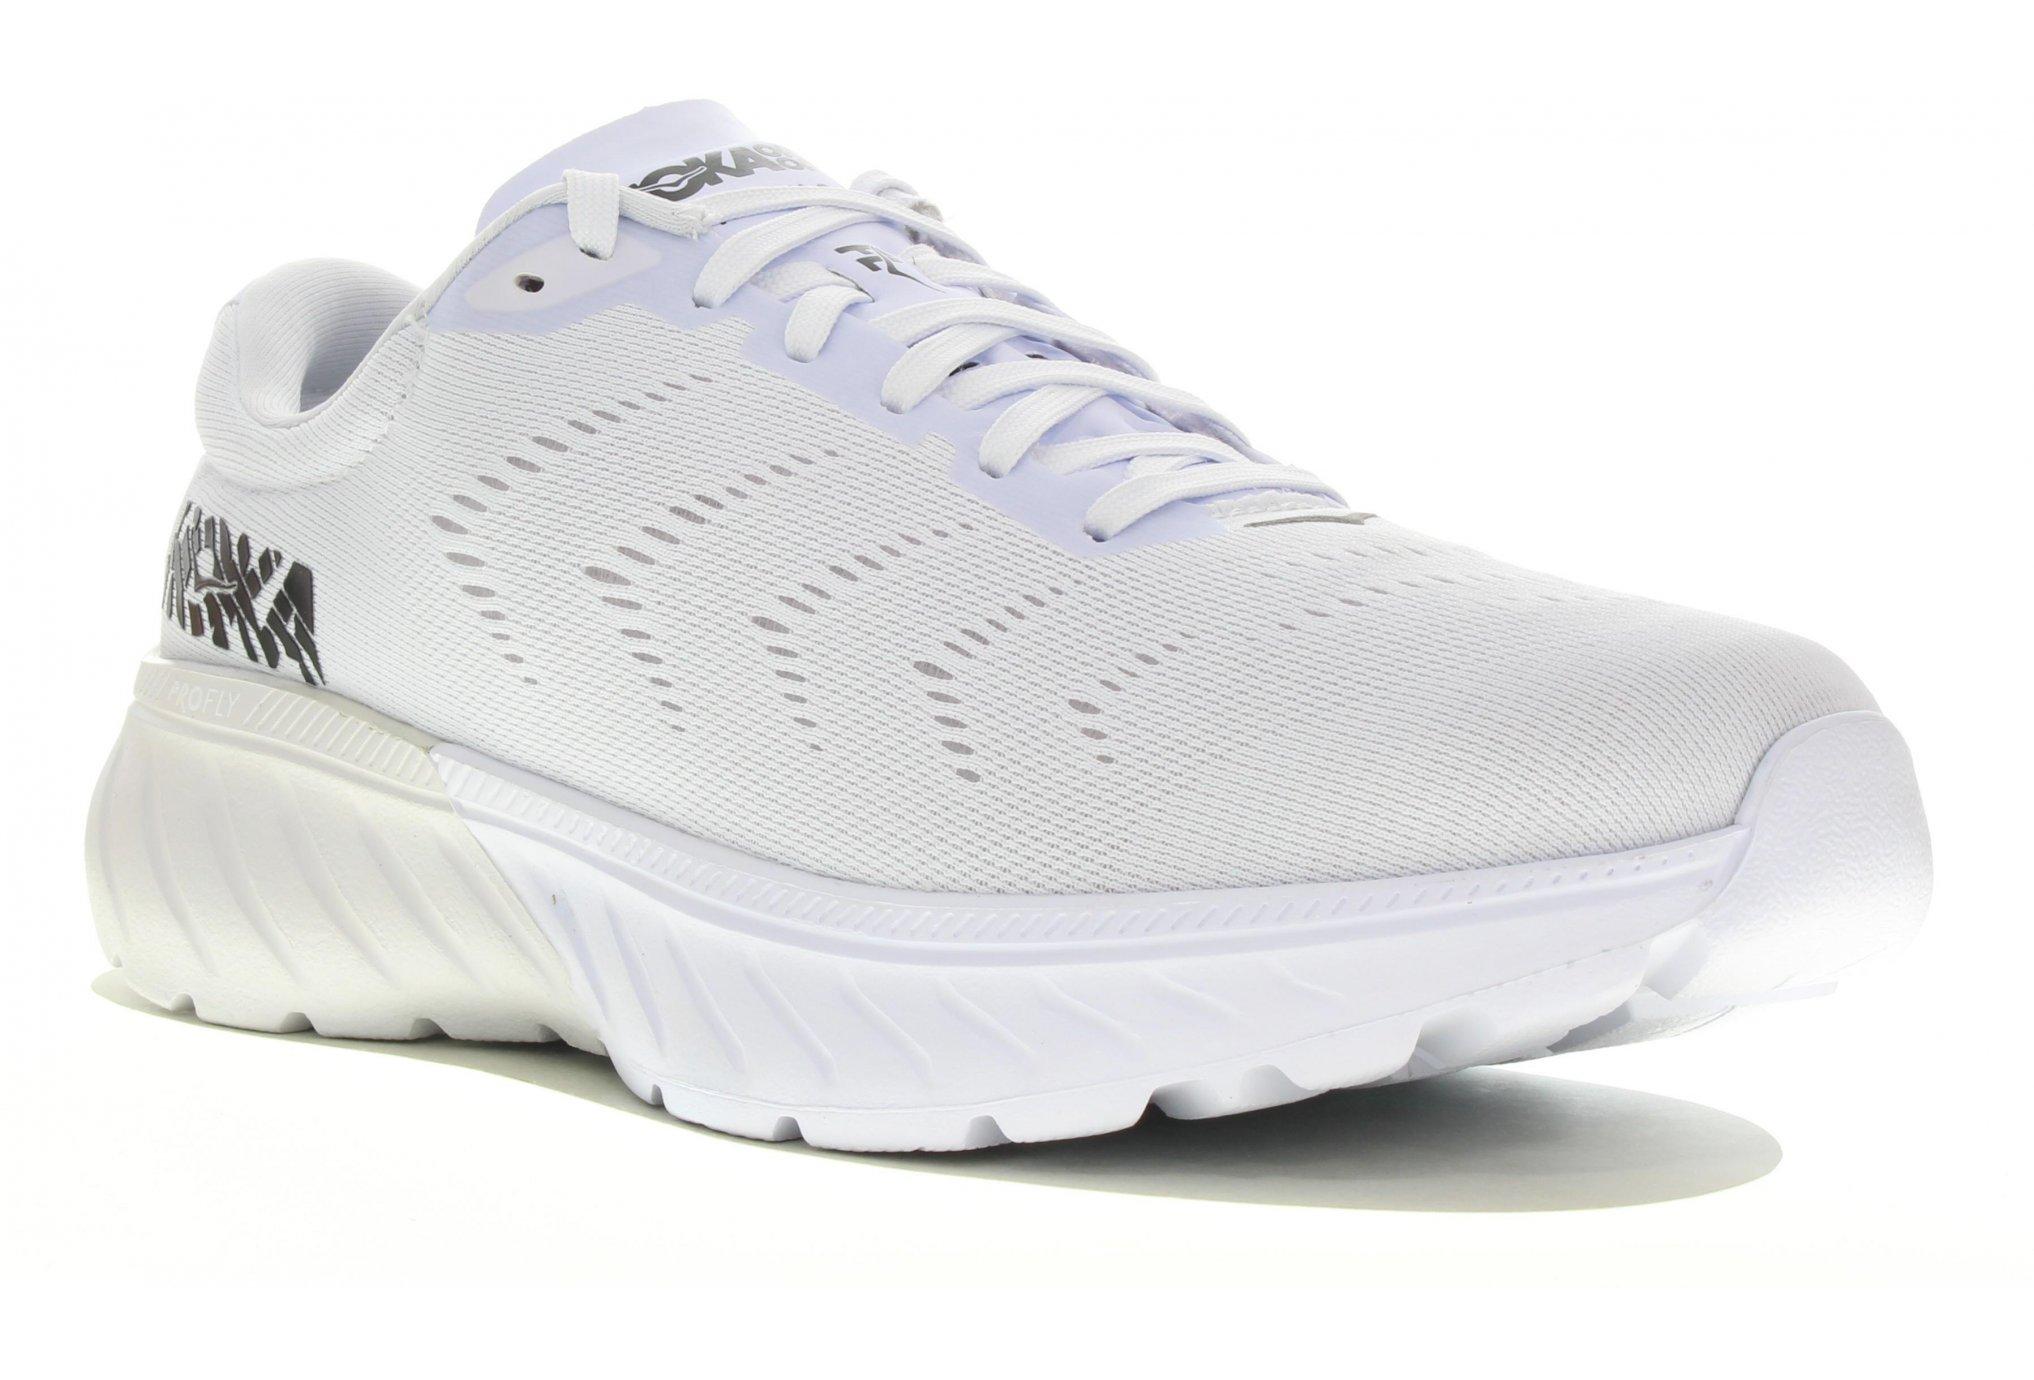 Hoka One One Mach 2 W Diététique Chaussures femme